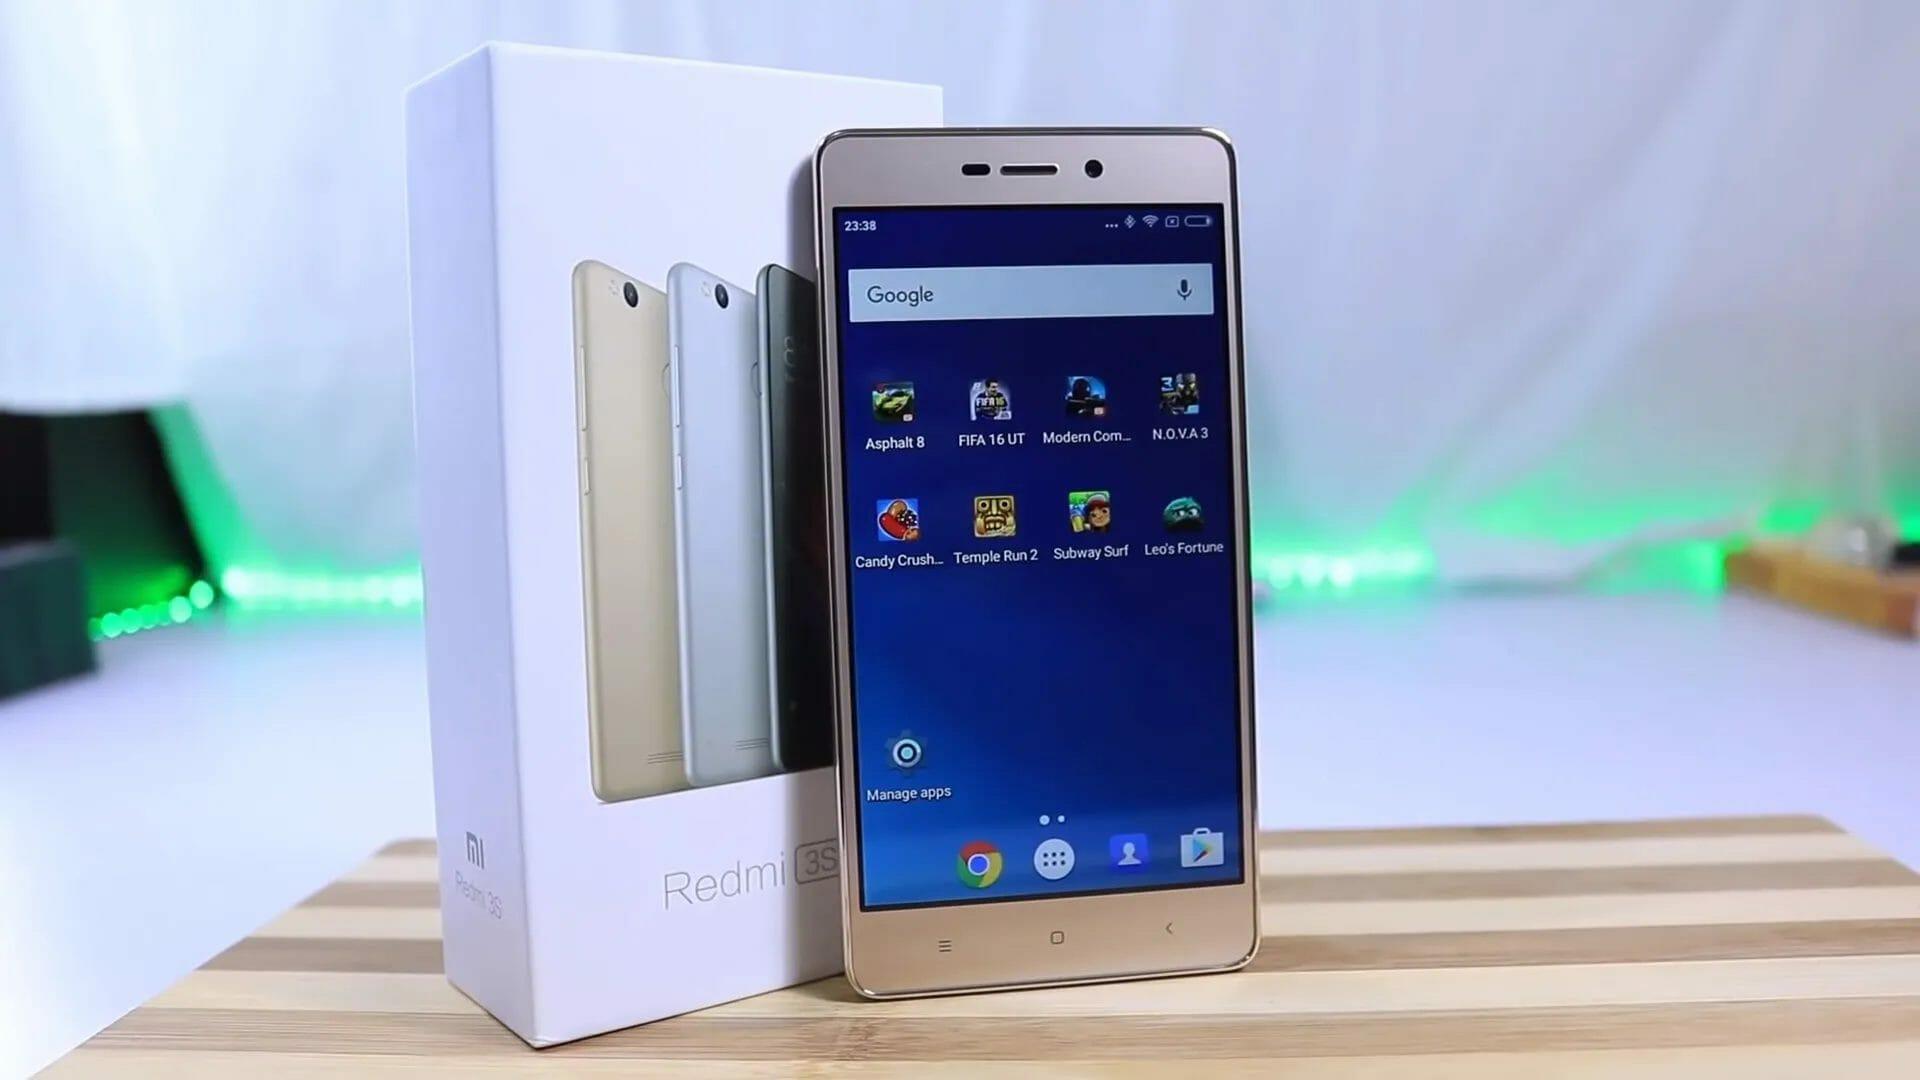 Android Phones Under 8000 Rupees Redmi 3s